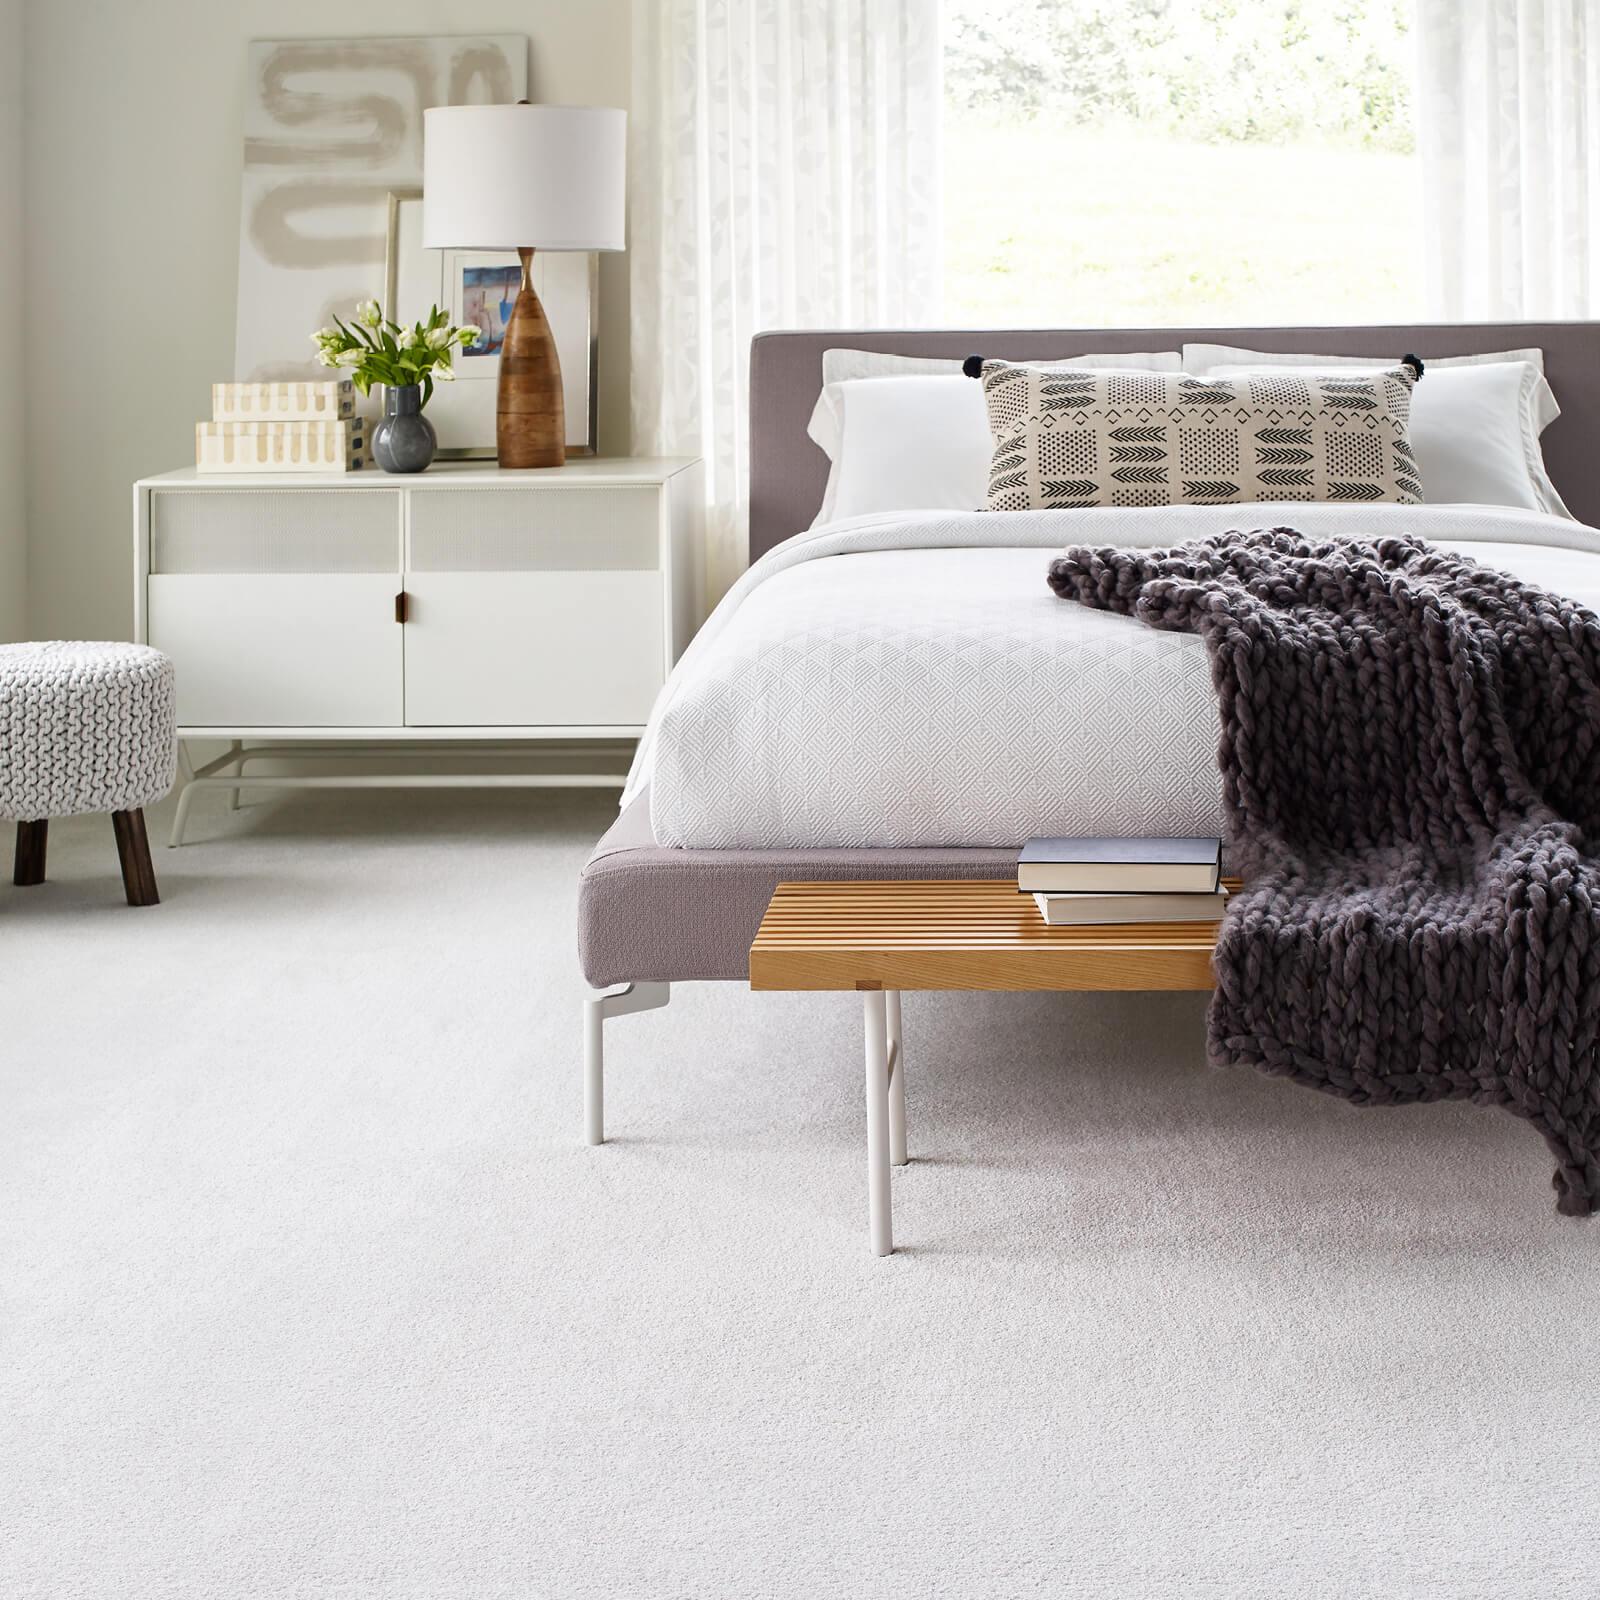 White carpet in bedroom | J/K Carpet Center, Inc